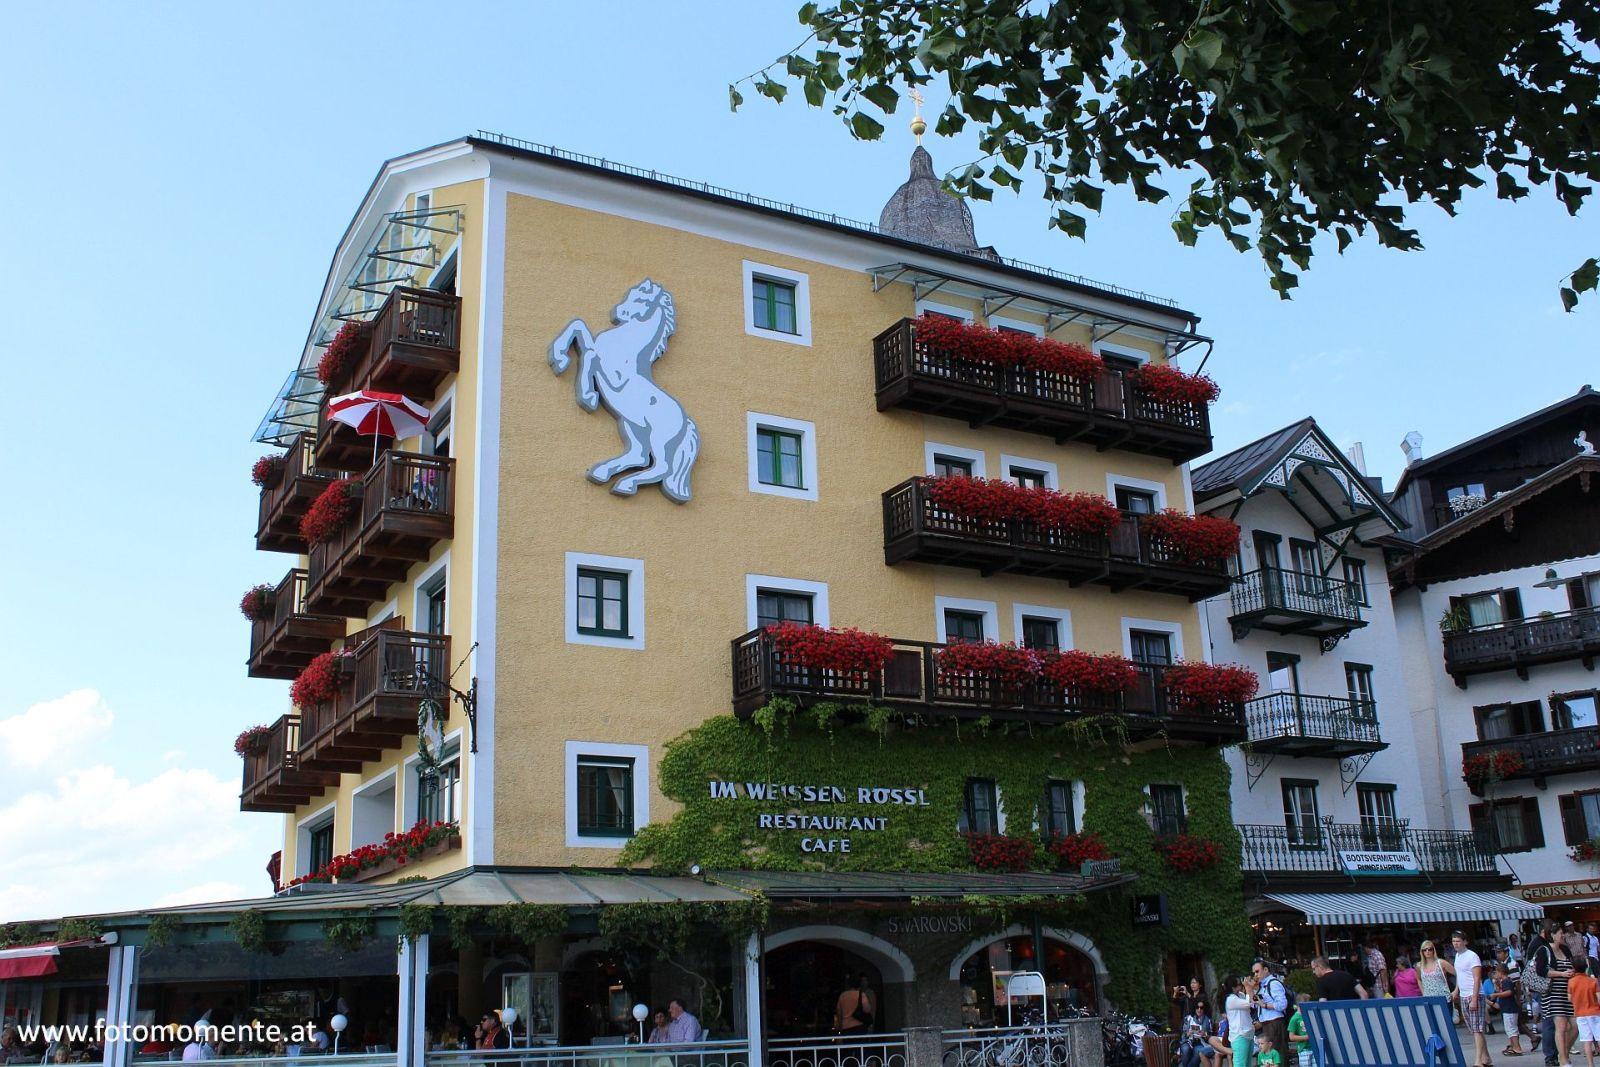 Im Weissen Rössl St. Wolfgang Wolfgangsee - Cafe Im Weissen Rössl in St. Wolfgang am Wolfgangsee